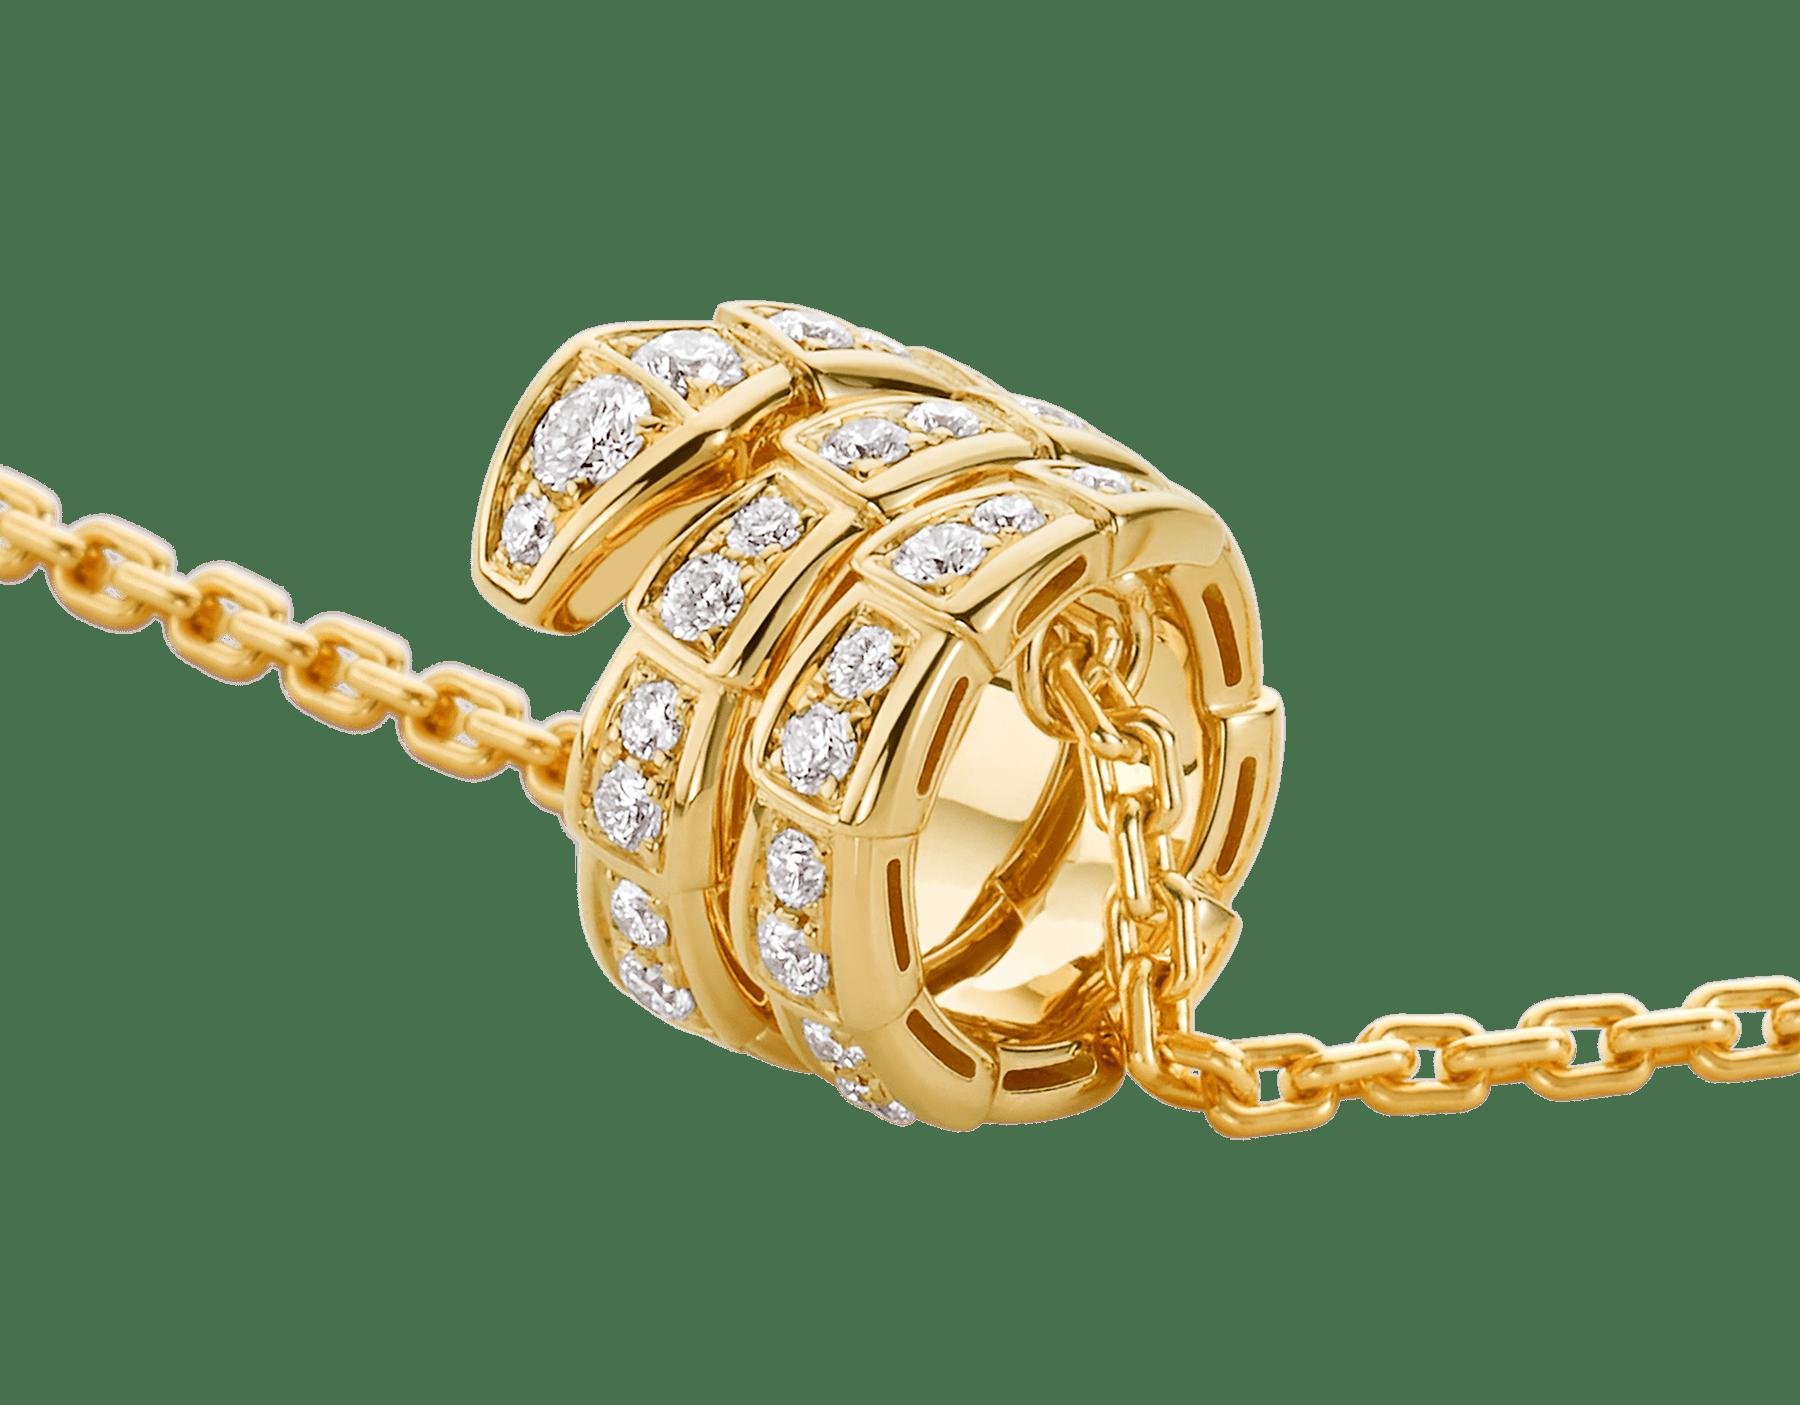 Serpenti Viper 18 kt yellow gold pendant necklace set with pavé diamonds 357936 image 3